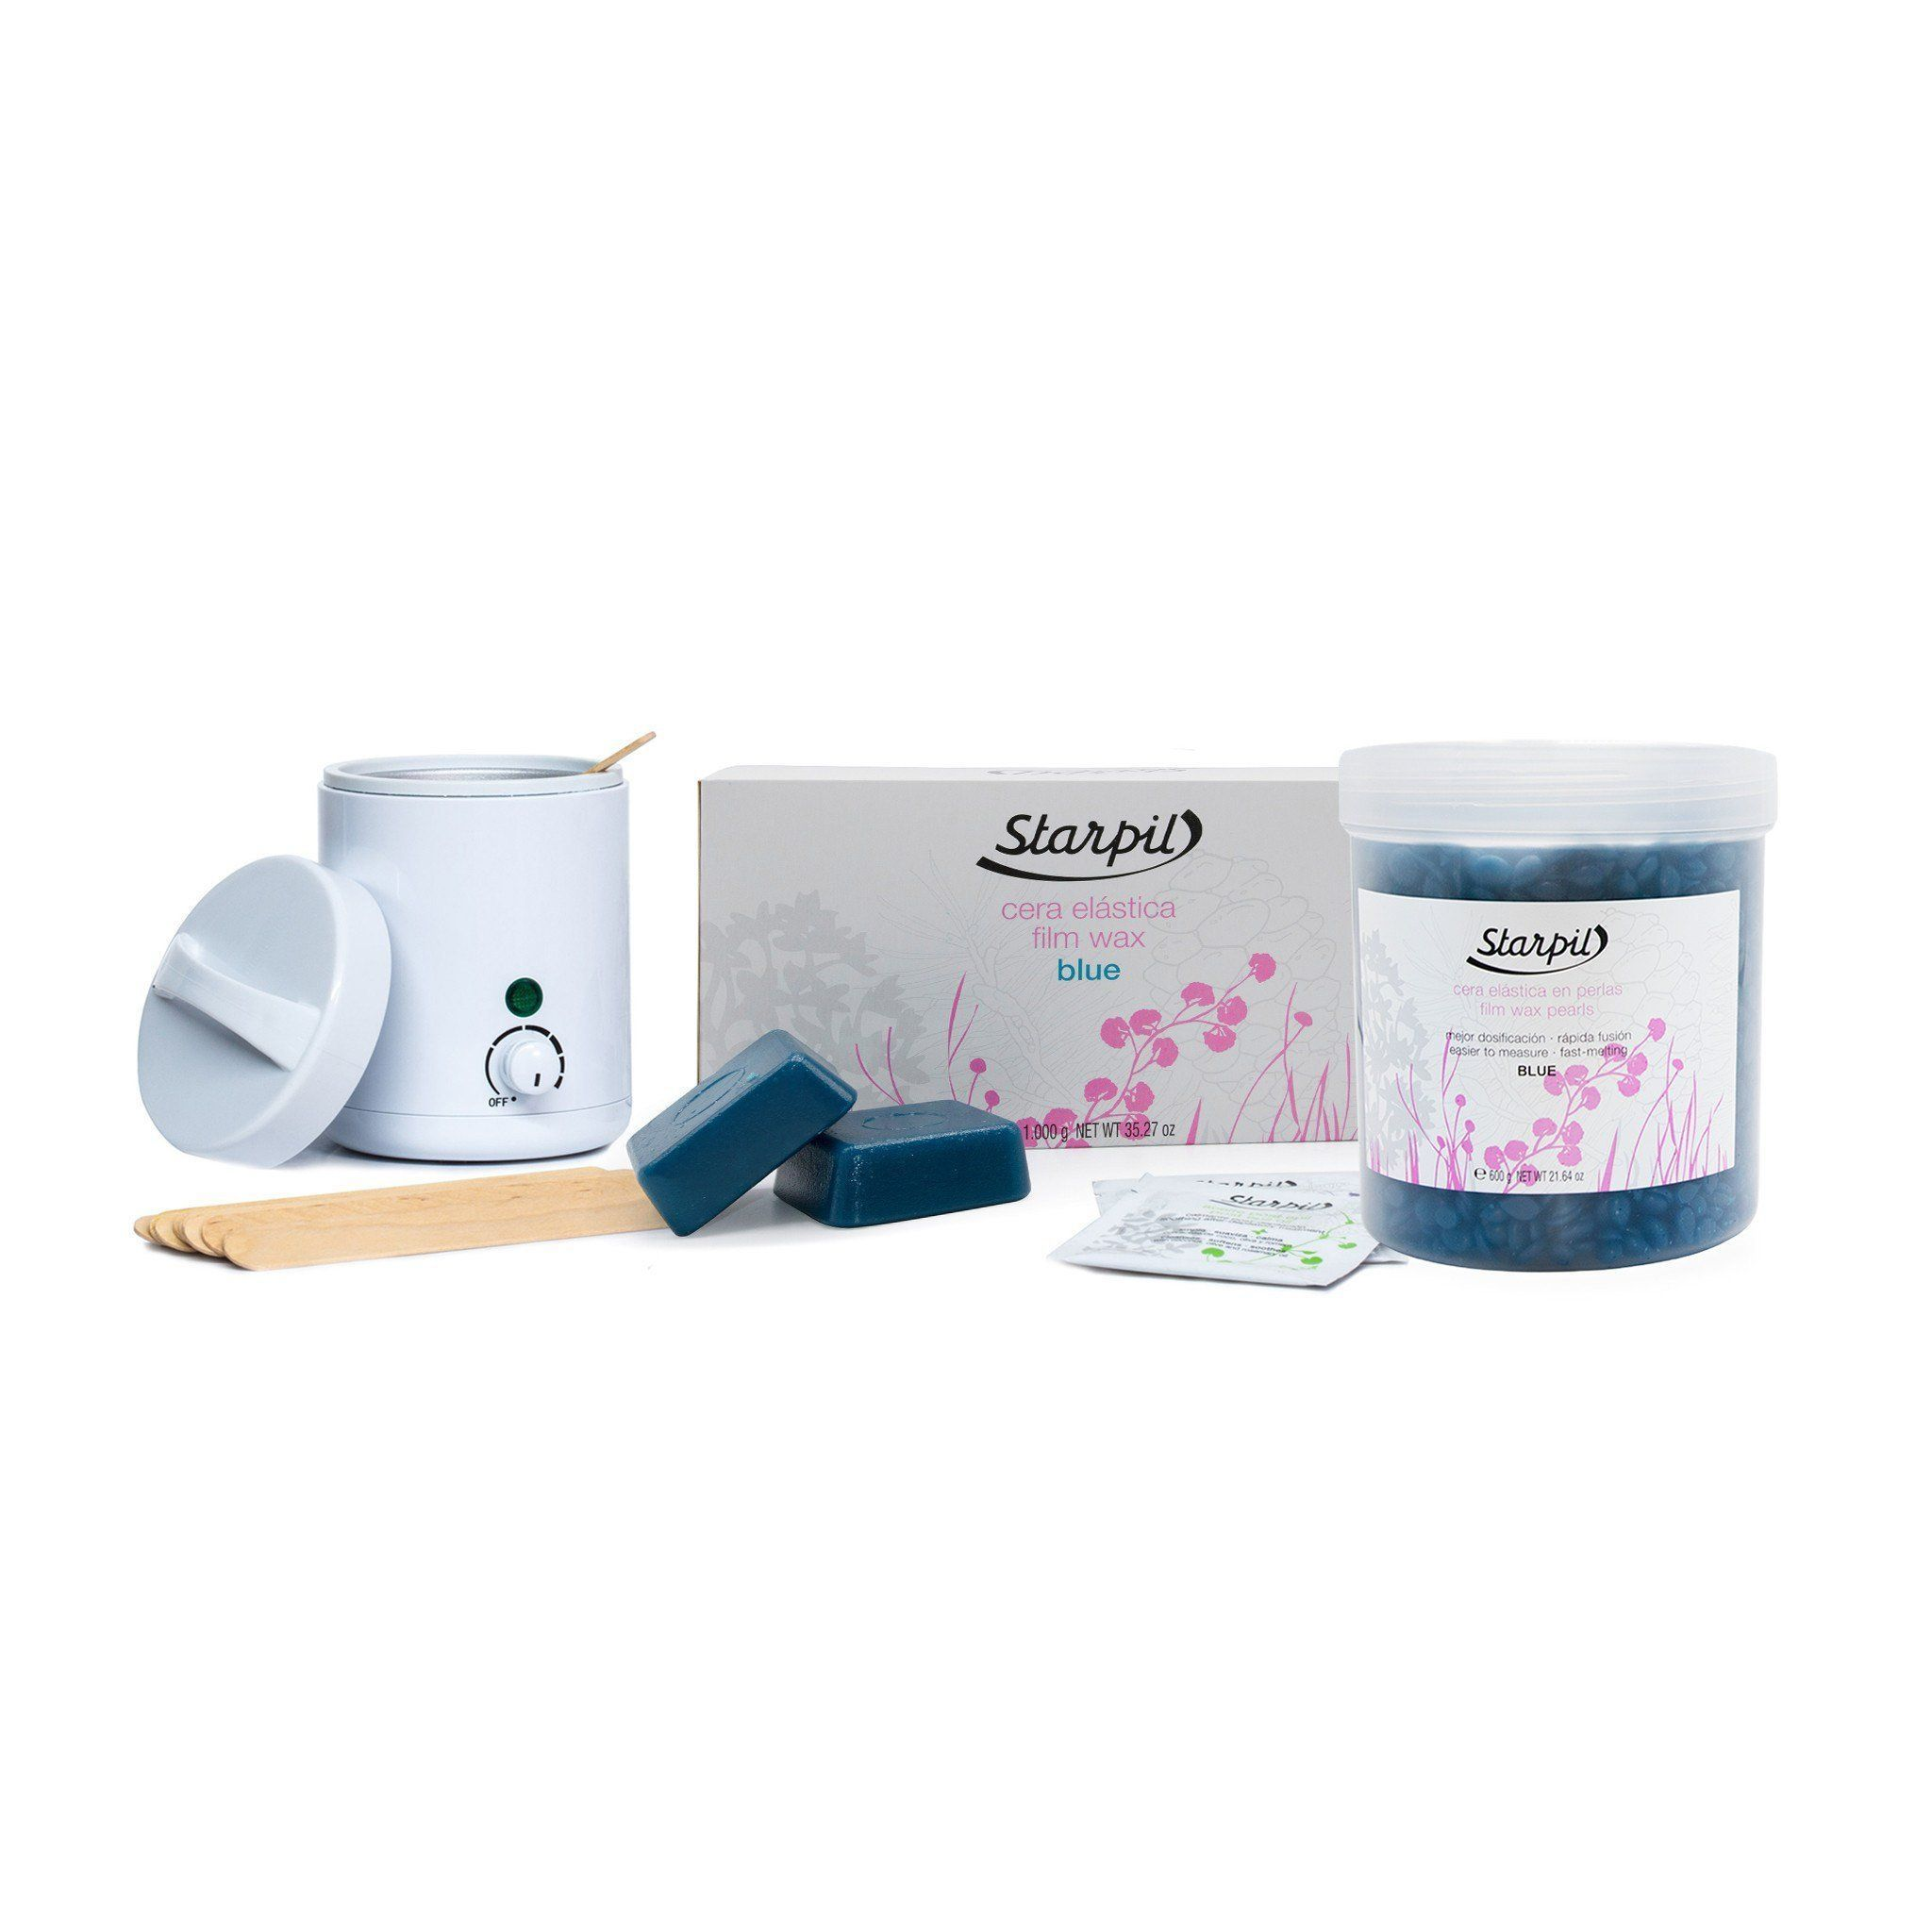 Facial Waxing Kit (Hard Wax) Waxing kit, Facial waxing